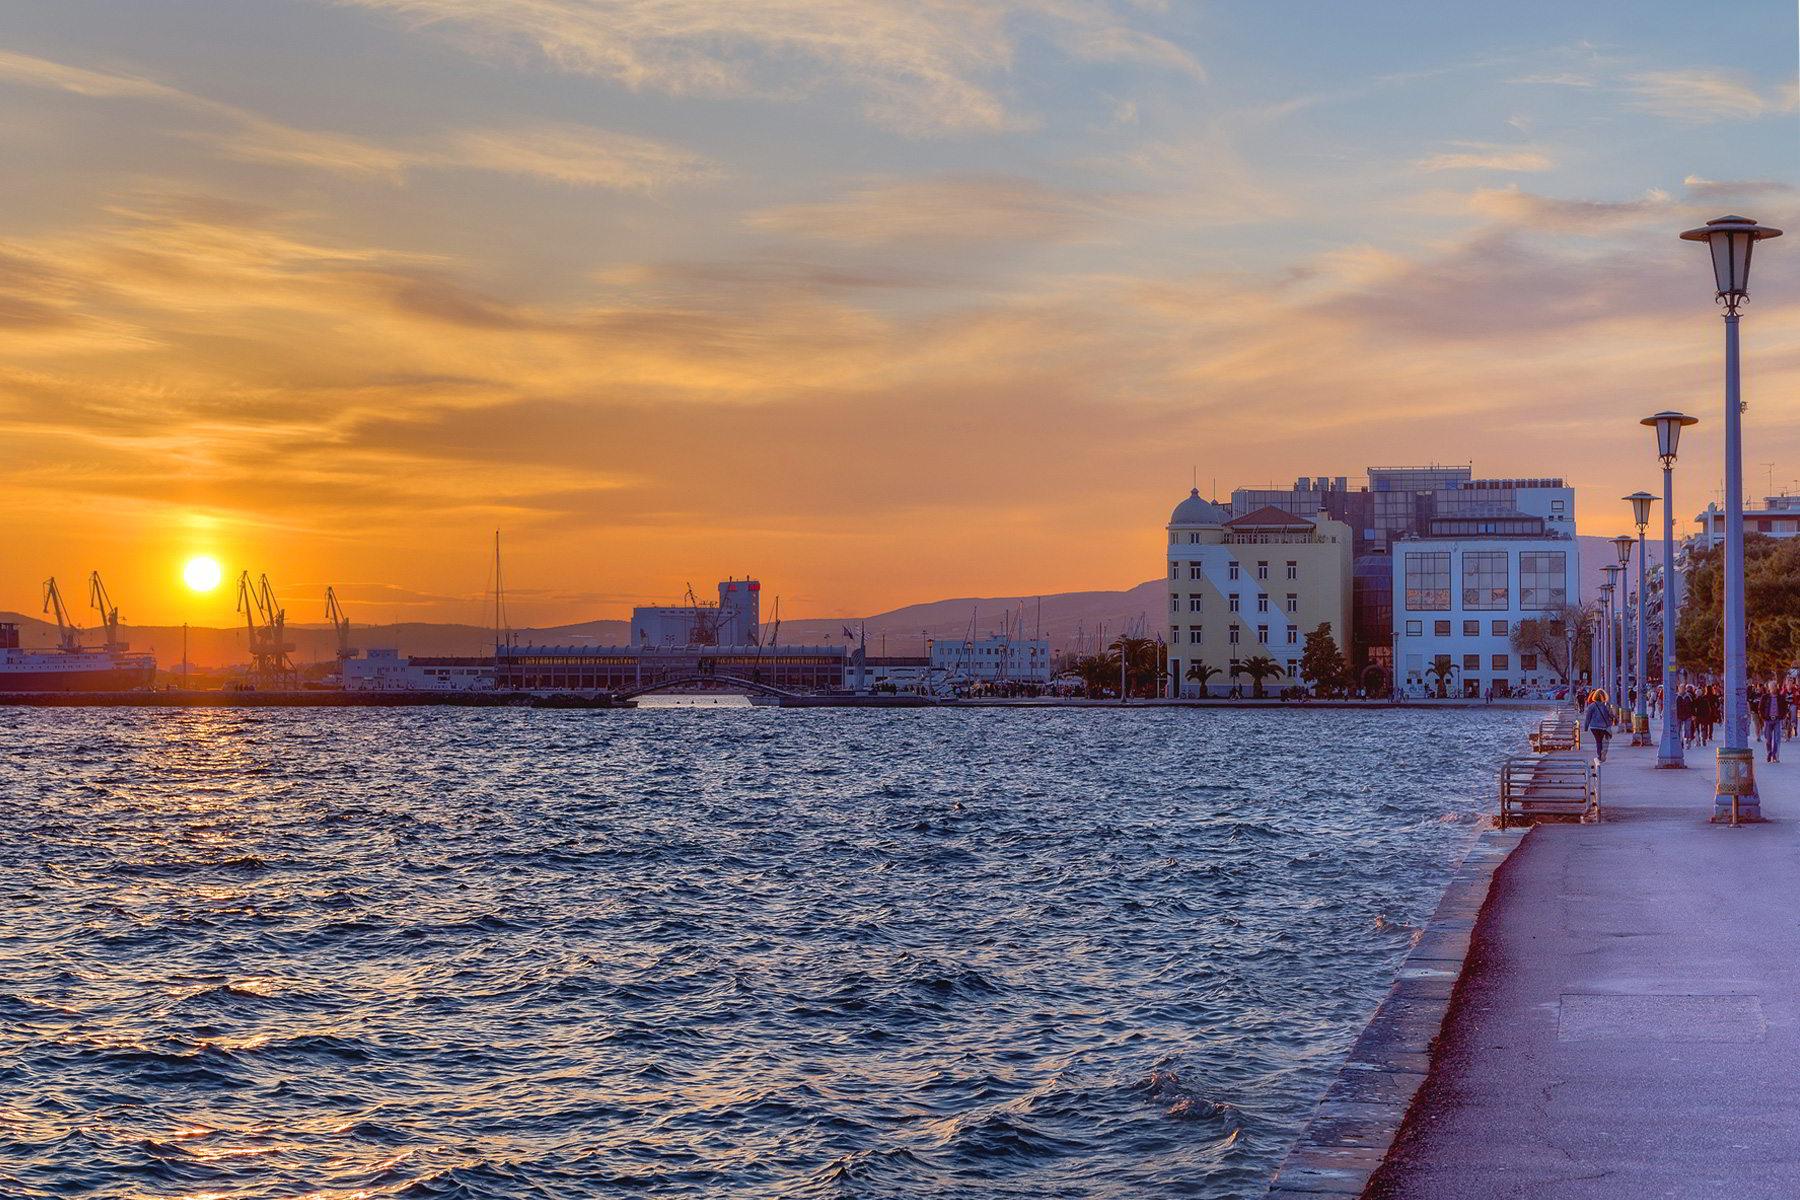 Guardian: Ποιοι δύο ελληνικοί προορισμοί βρίσκονται ανάμεσα στους 12 ομορφότερους της Νότιας Ευρώπης;